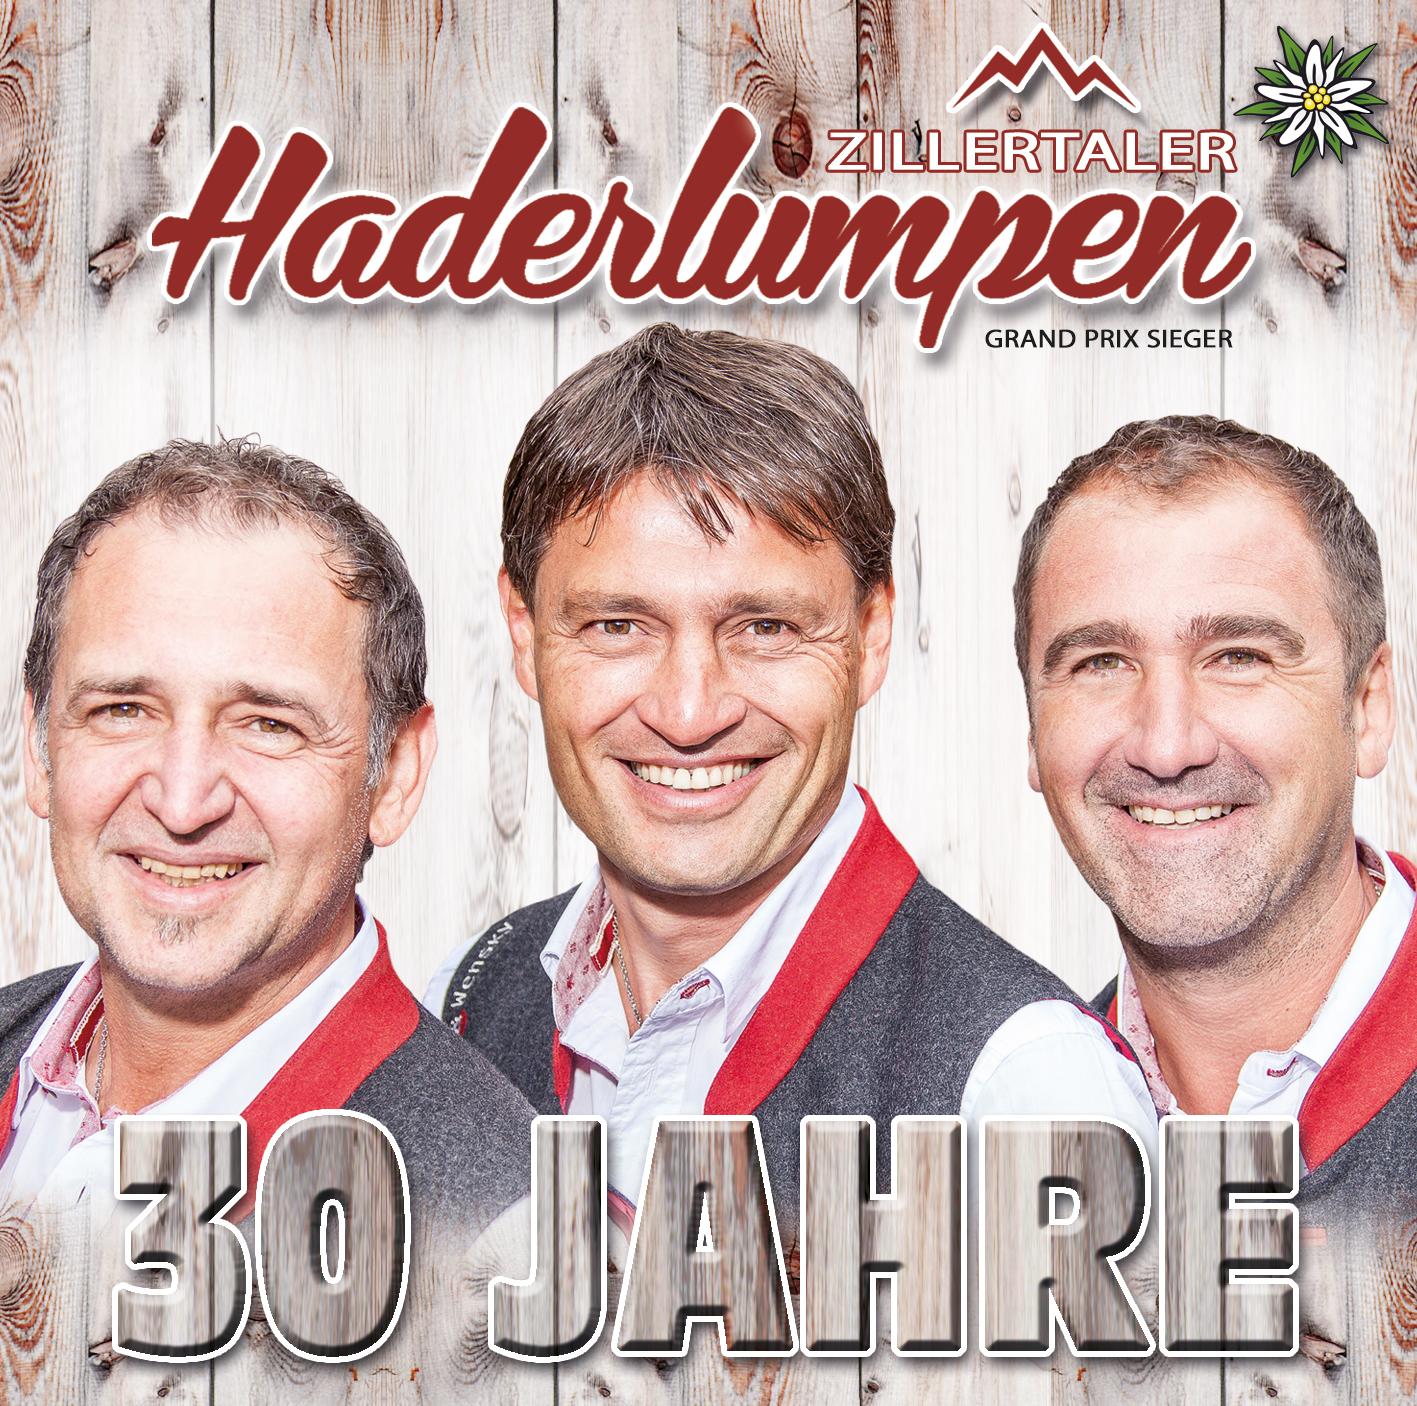 CD Haderlumpen 2017